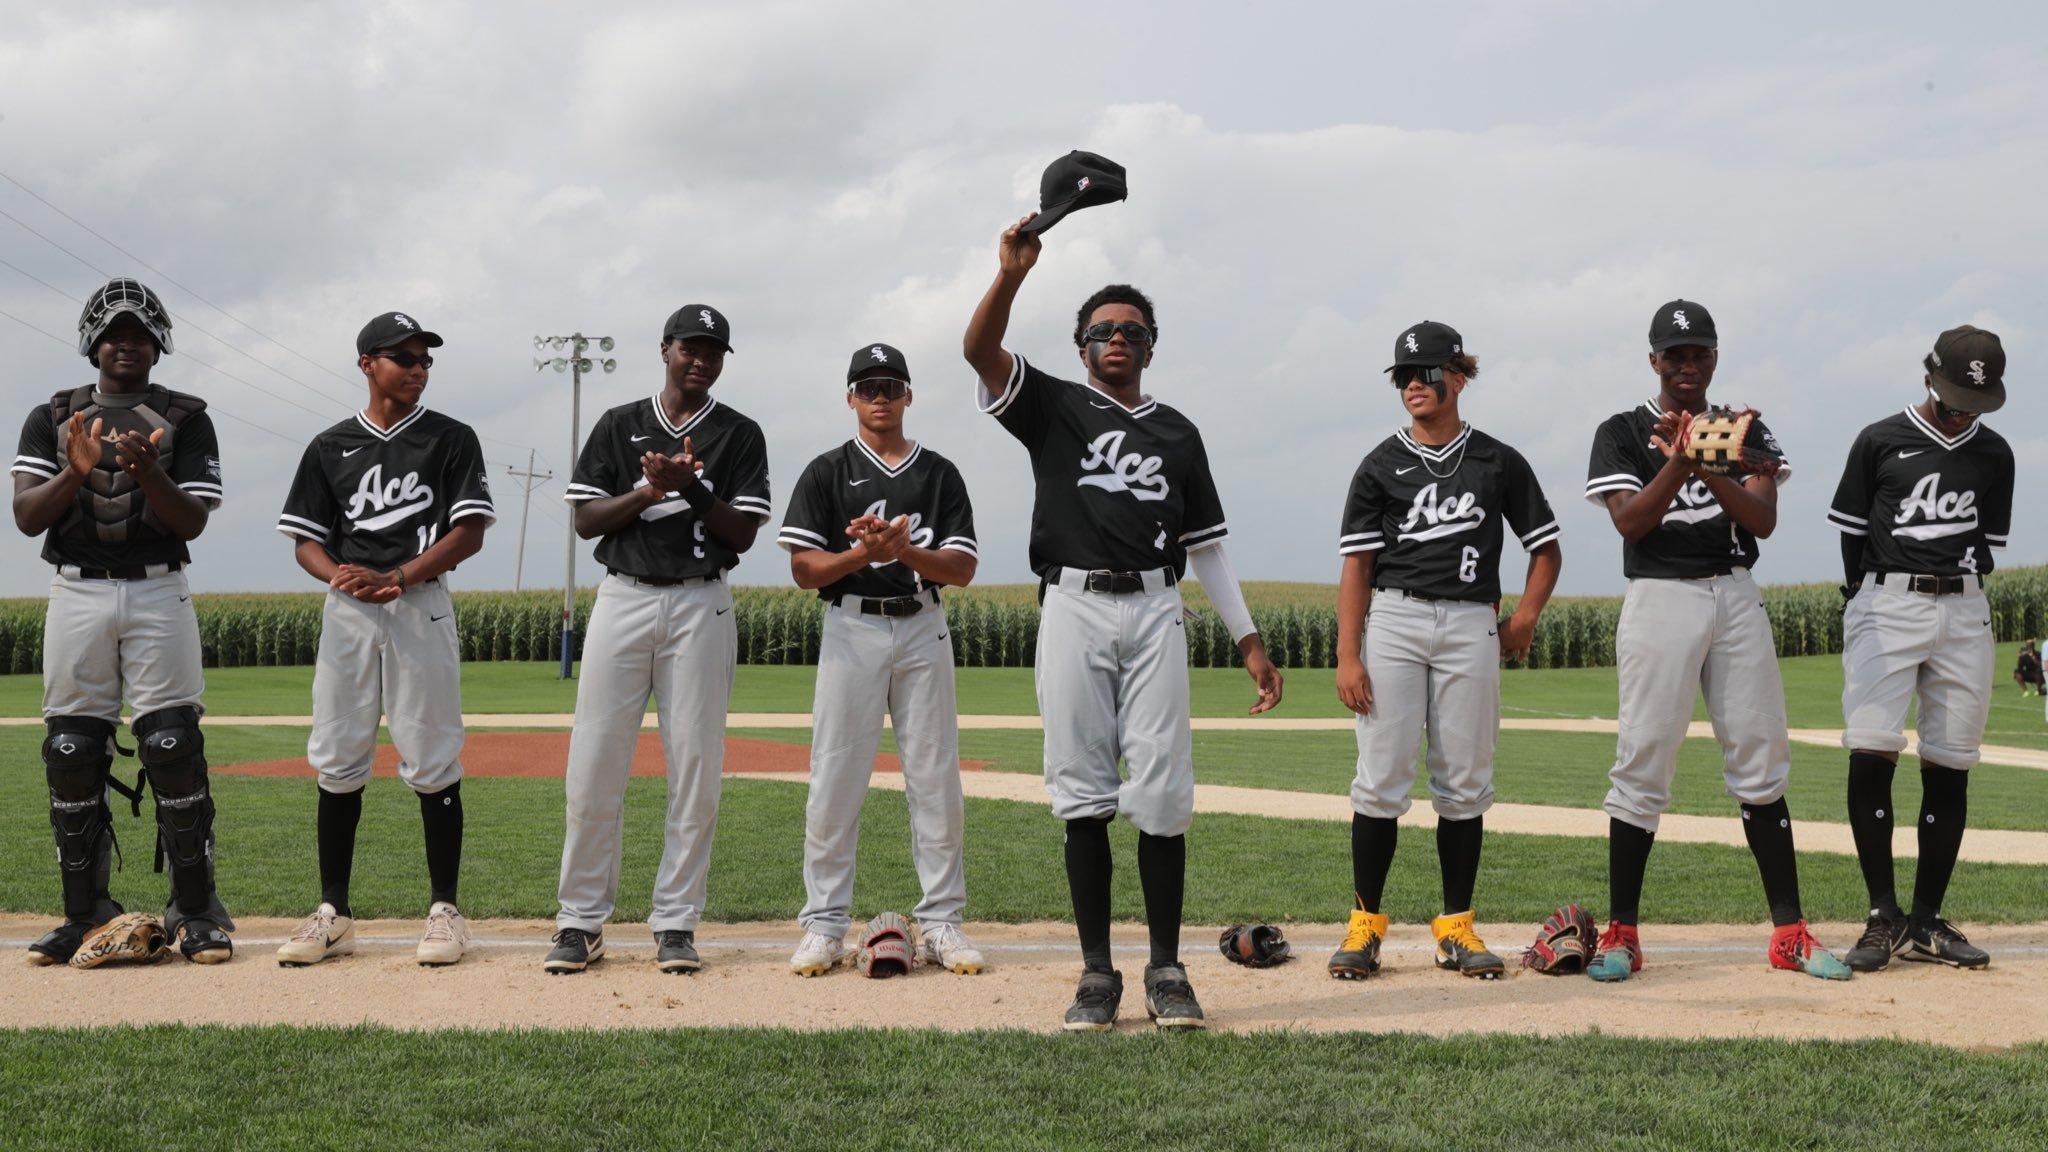 ACE U14 Team Credit: MLB Photos